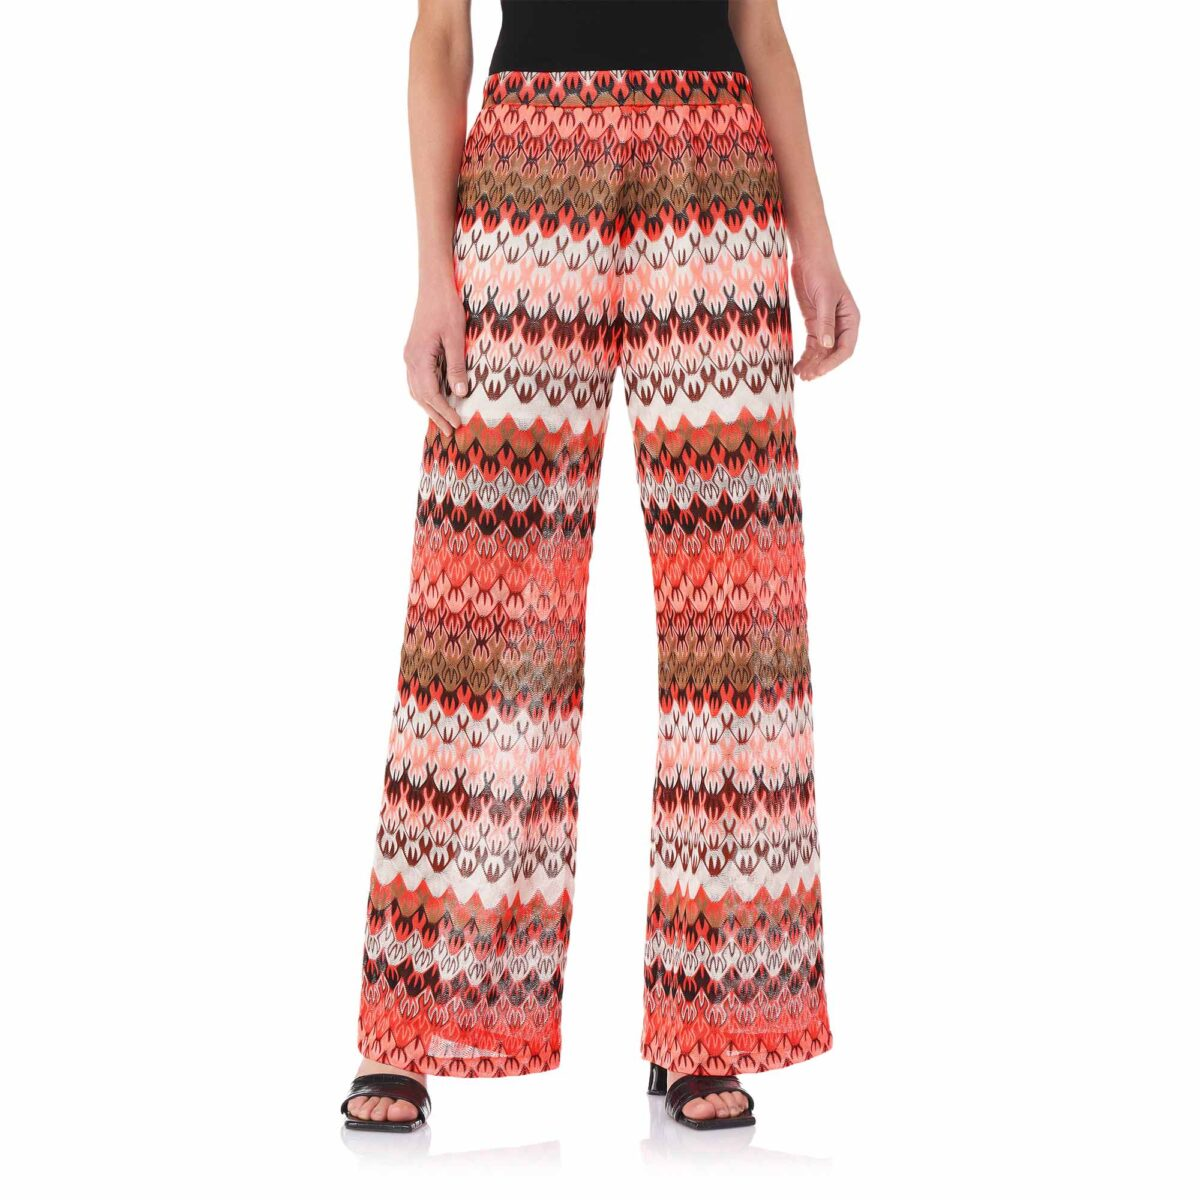 Pantalone Wide leg a maglia raschel Multicolor - Nicla